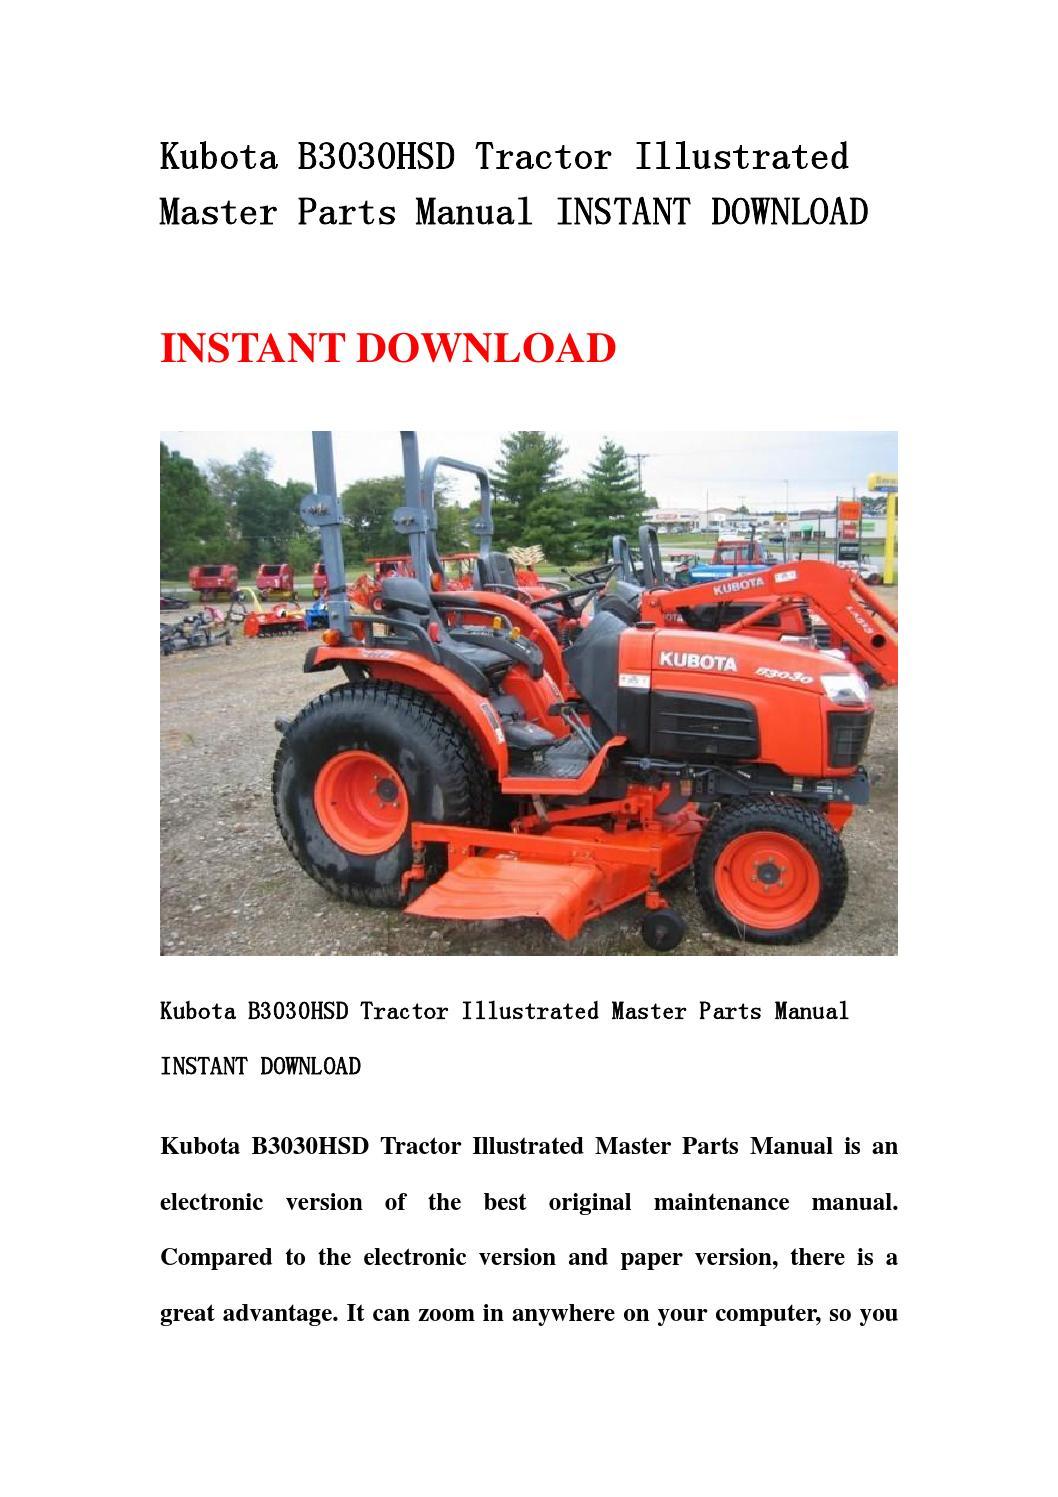 Top Link Kubota Parts : Kubota b hsd tractor illustrated master parts manual